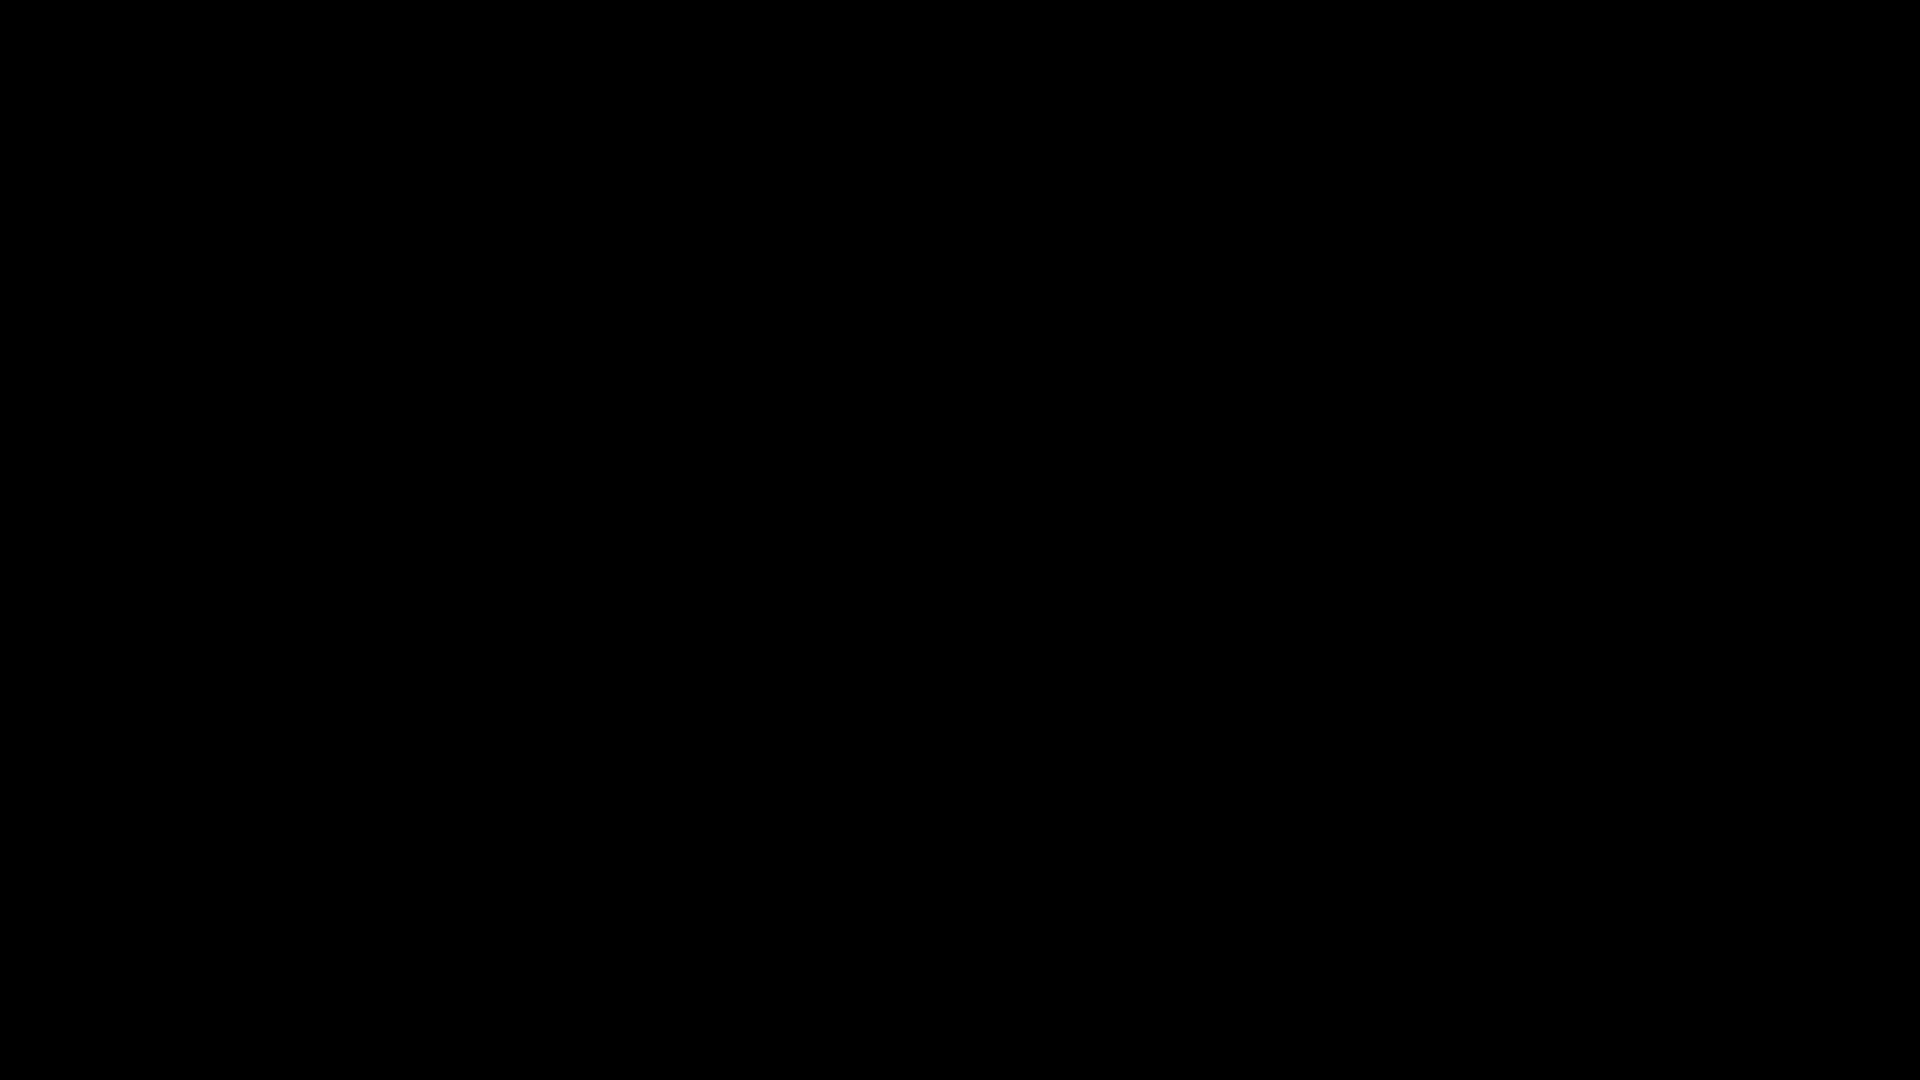 Amsterdam Airport Schiphol (Airport), Antwerp Central Station (Transit Stop), Bruxelles, Driving, Nederland, Rotterdam, brussel centraal, brussel noord, brussel zuid, cab ride, cockpit, cockpit view, dash cam, high speed, hsl zuid, hsr, mechelen, rotterdam central, schiphol, sncf, Drivers Eye View TGV Thalys Amsterdam - Brussels 2015 GIFs